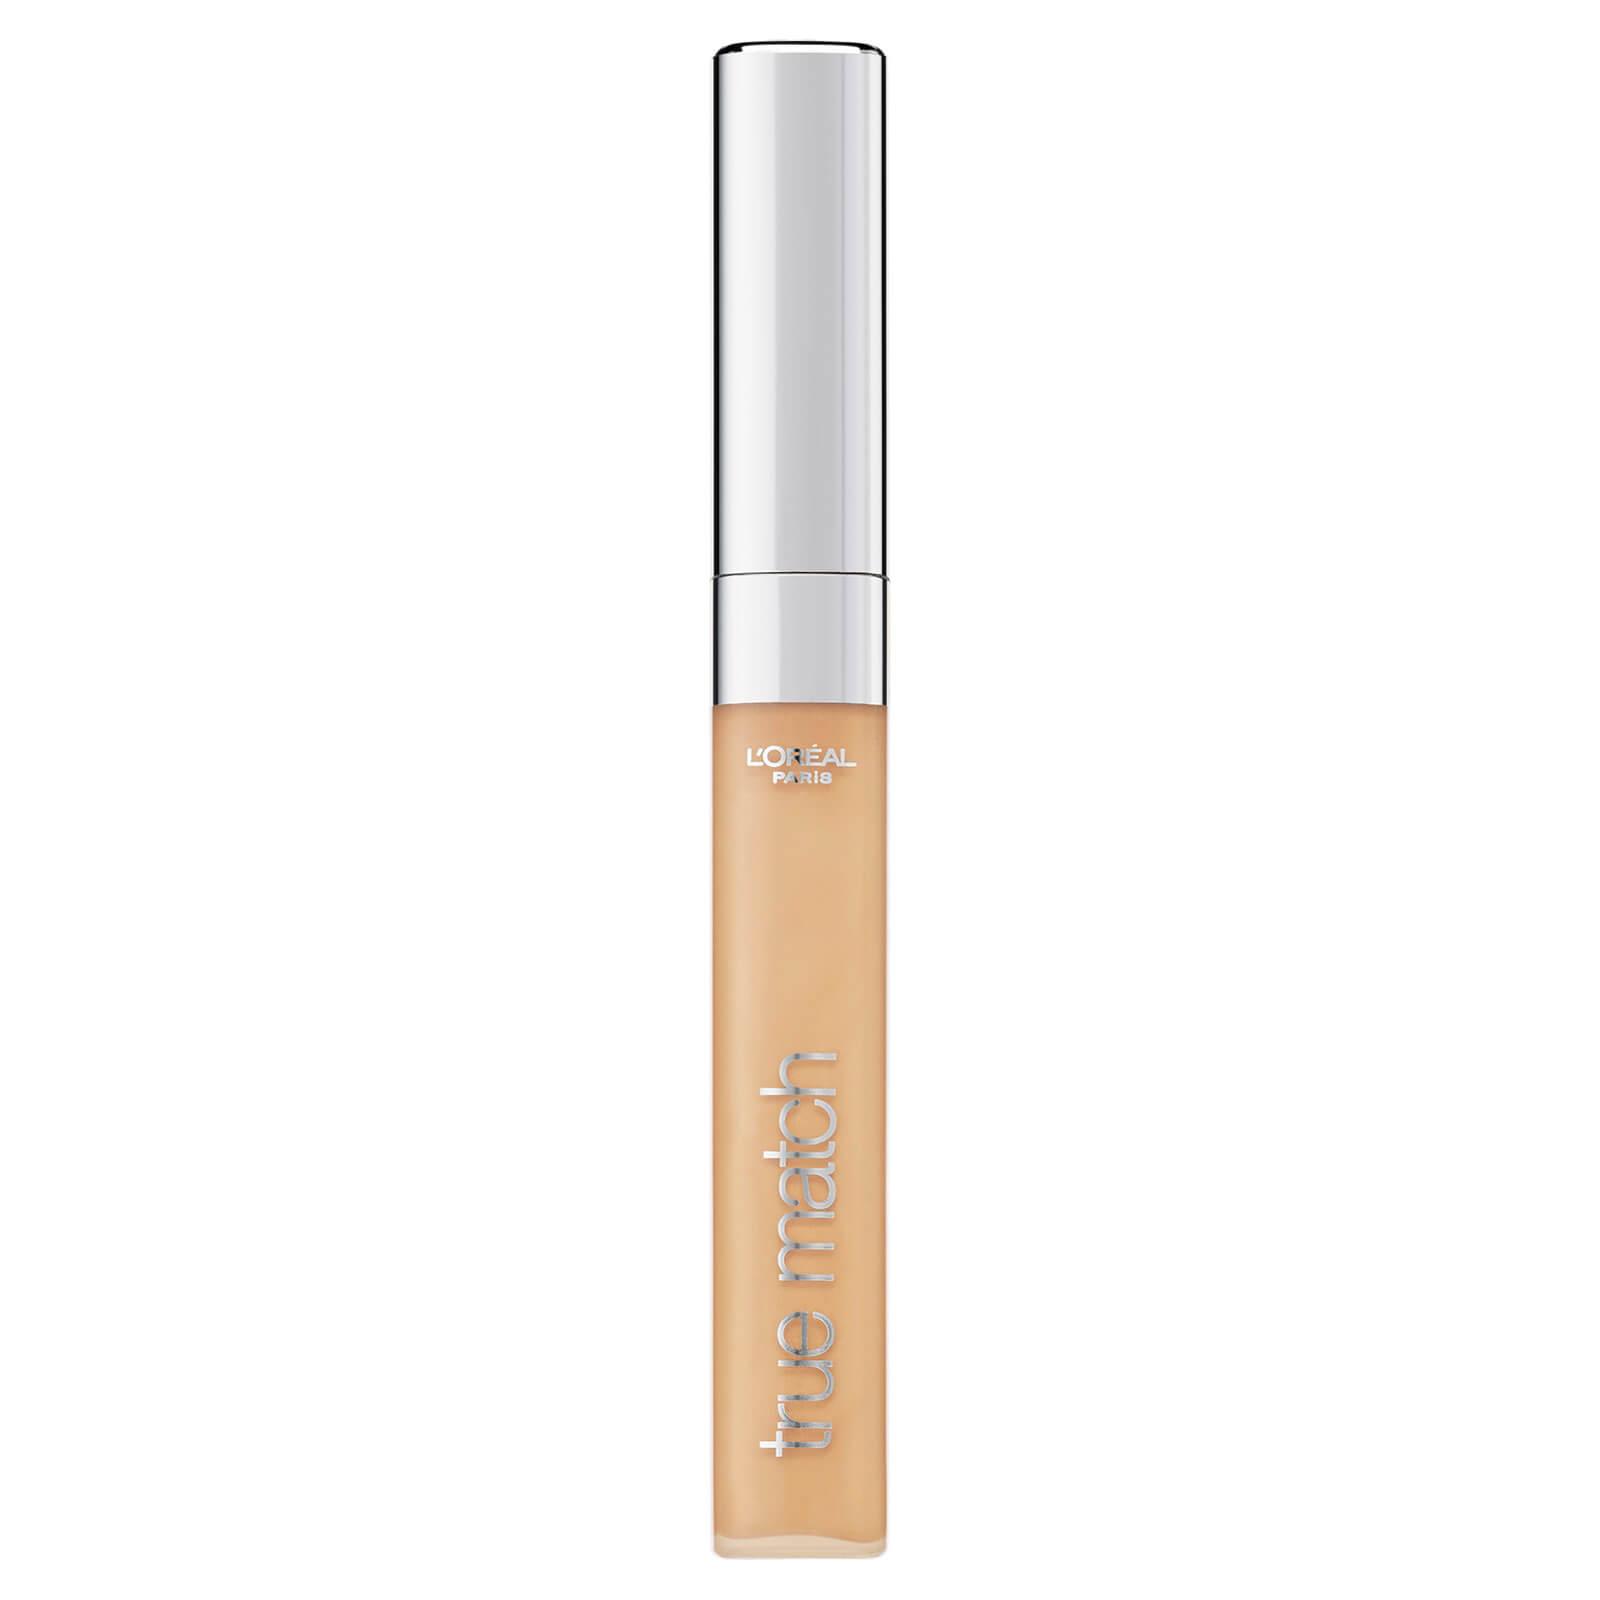 L'Oréal Paris True Match The One Concealer 6.8ml (Various Shades) - 2C Vanilla Rose